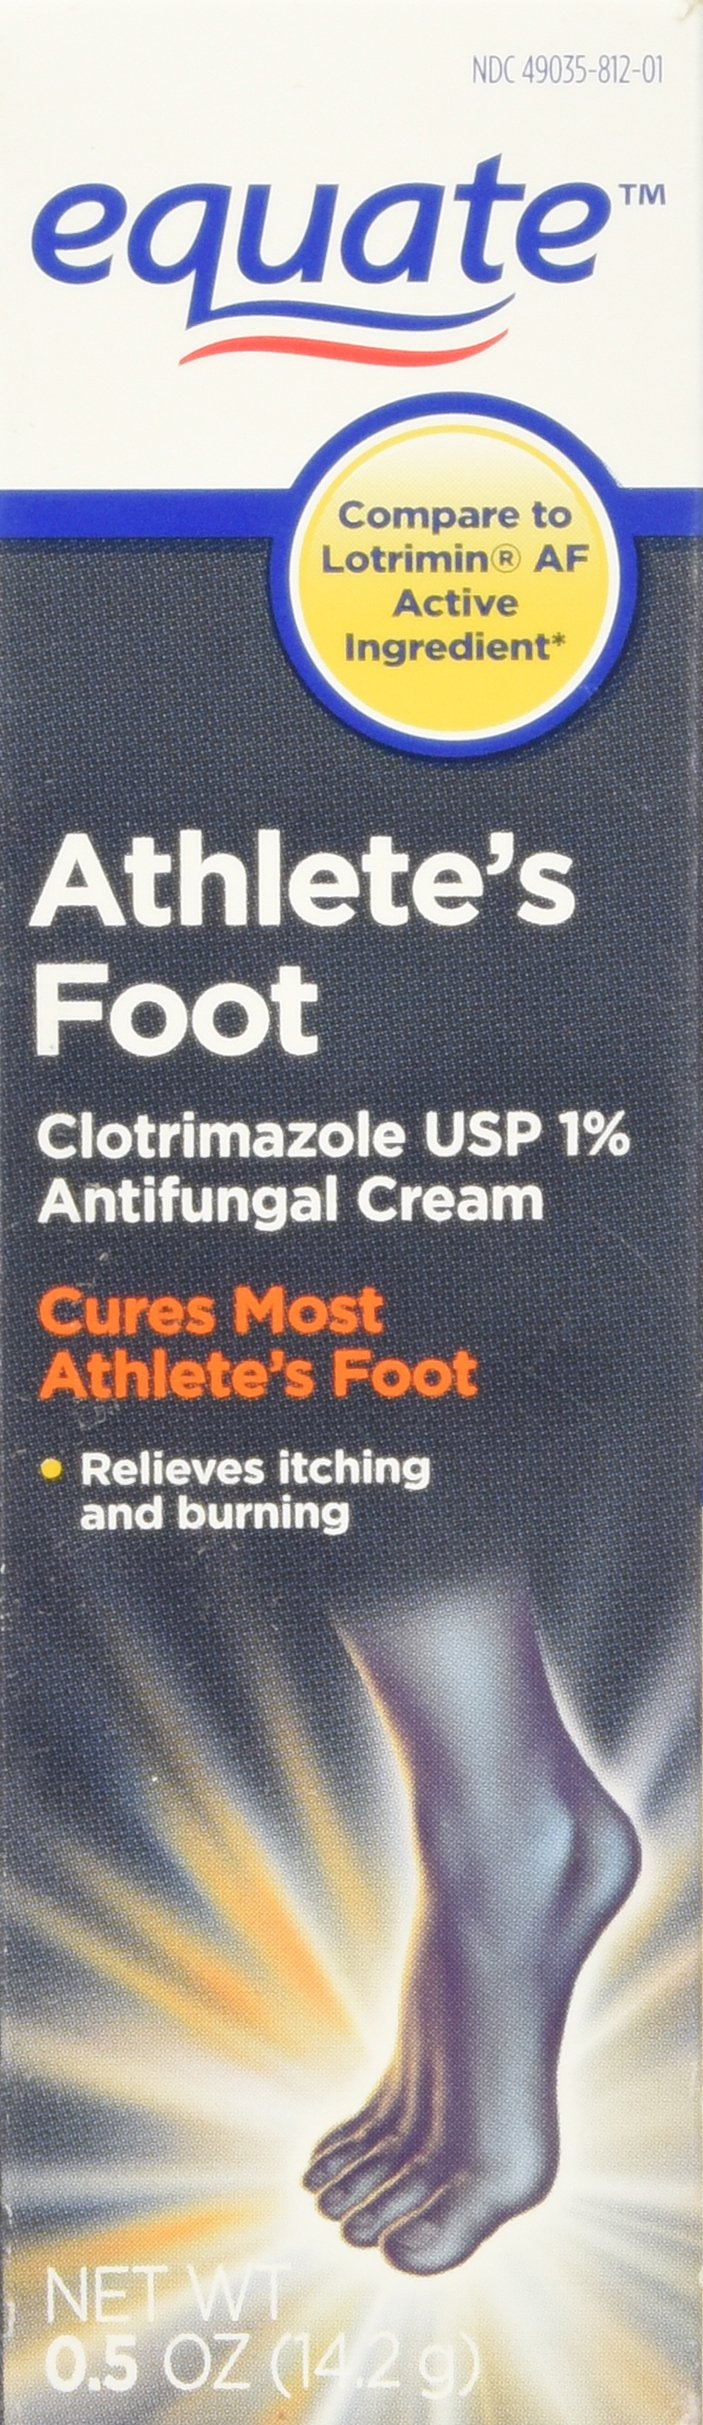 Equate Athlete's Foot .5oz Clotrimazole Anti Fungal Cream Compare to Lotrimin AF